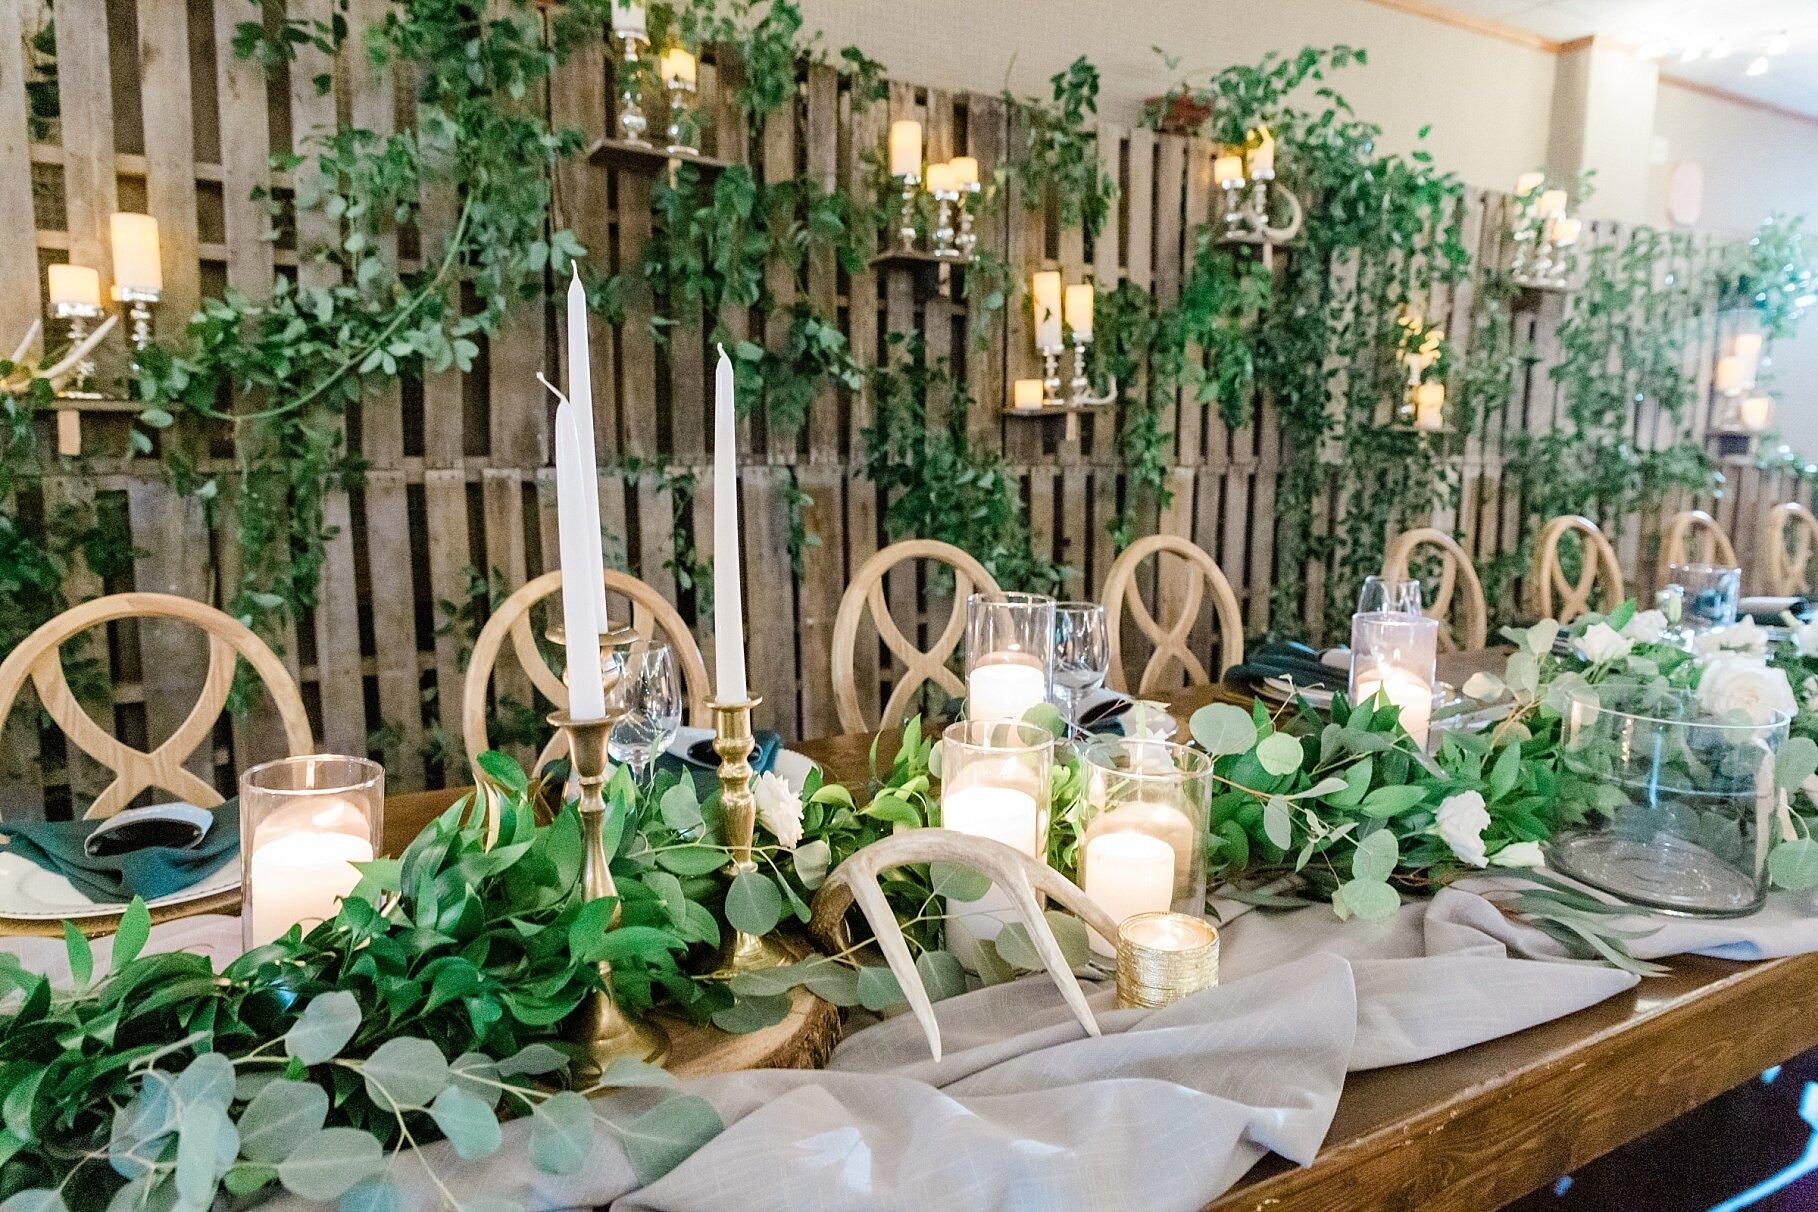 Earth-Toned Wedding by KKP Associate Wedding Photographer and Kelsi Kliethermes Photography Best Columbia Missouri Wedding Photographer_0004.jpg